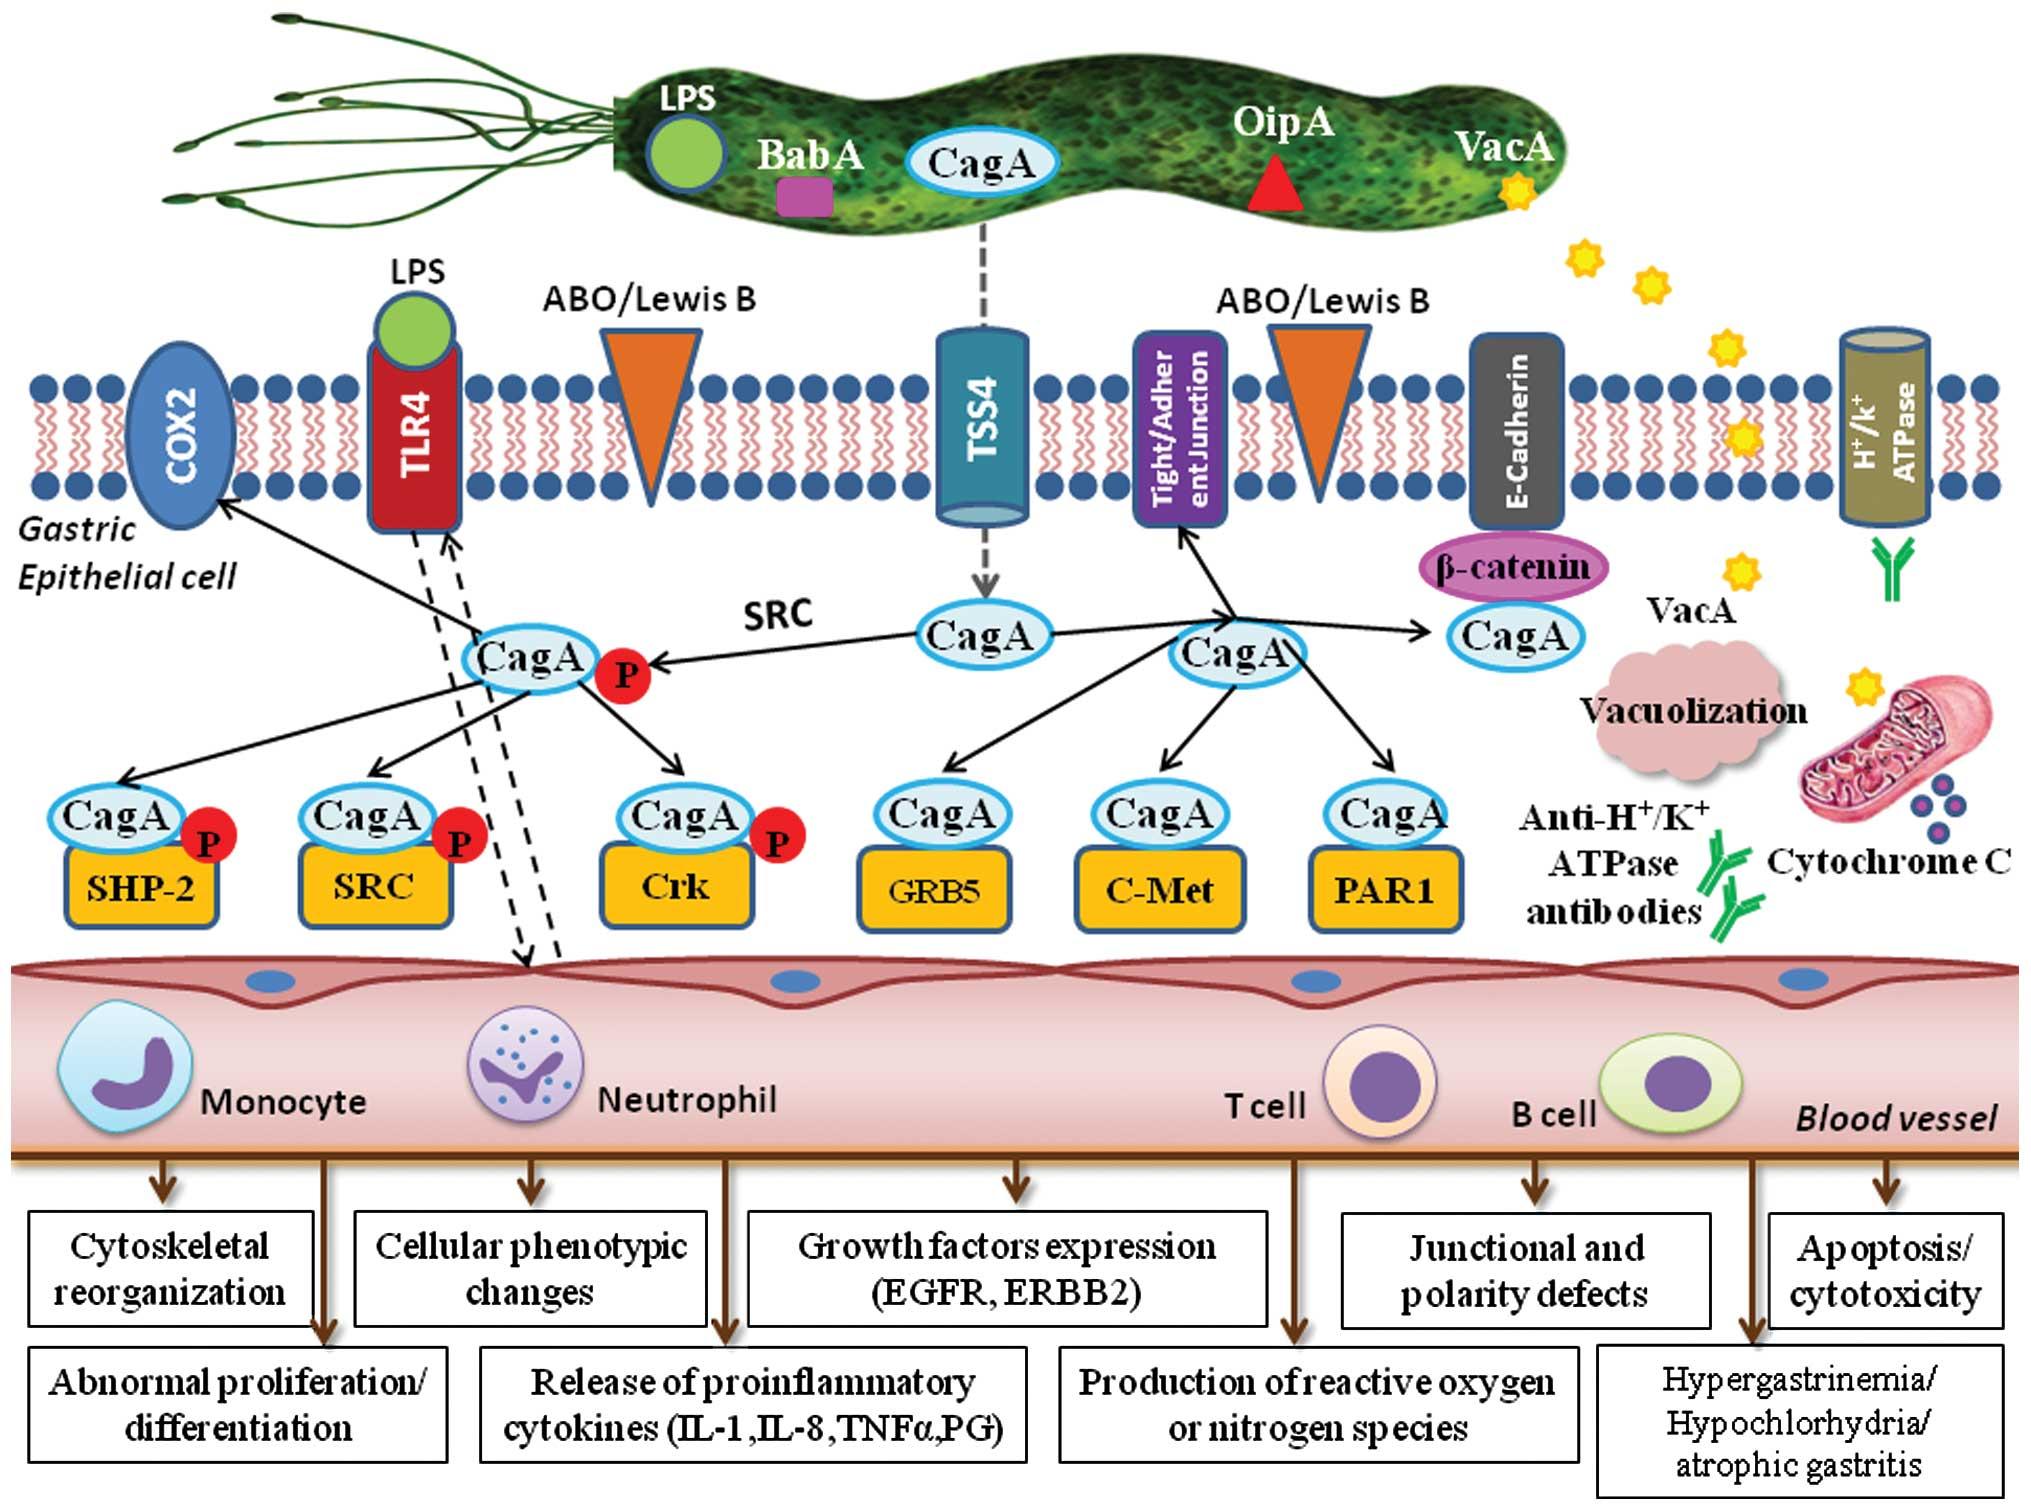 7 Intrebari si raspunsuri despre infectia cu Helicobacter Pylori